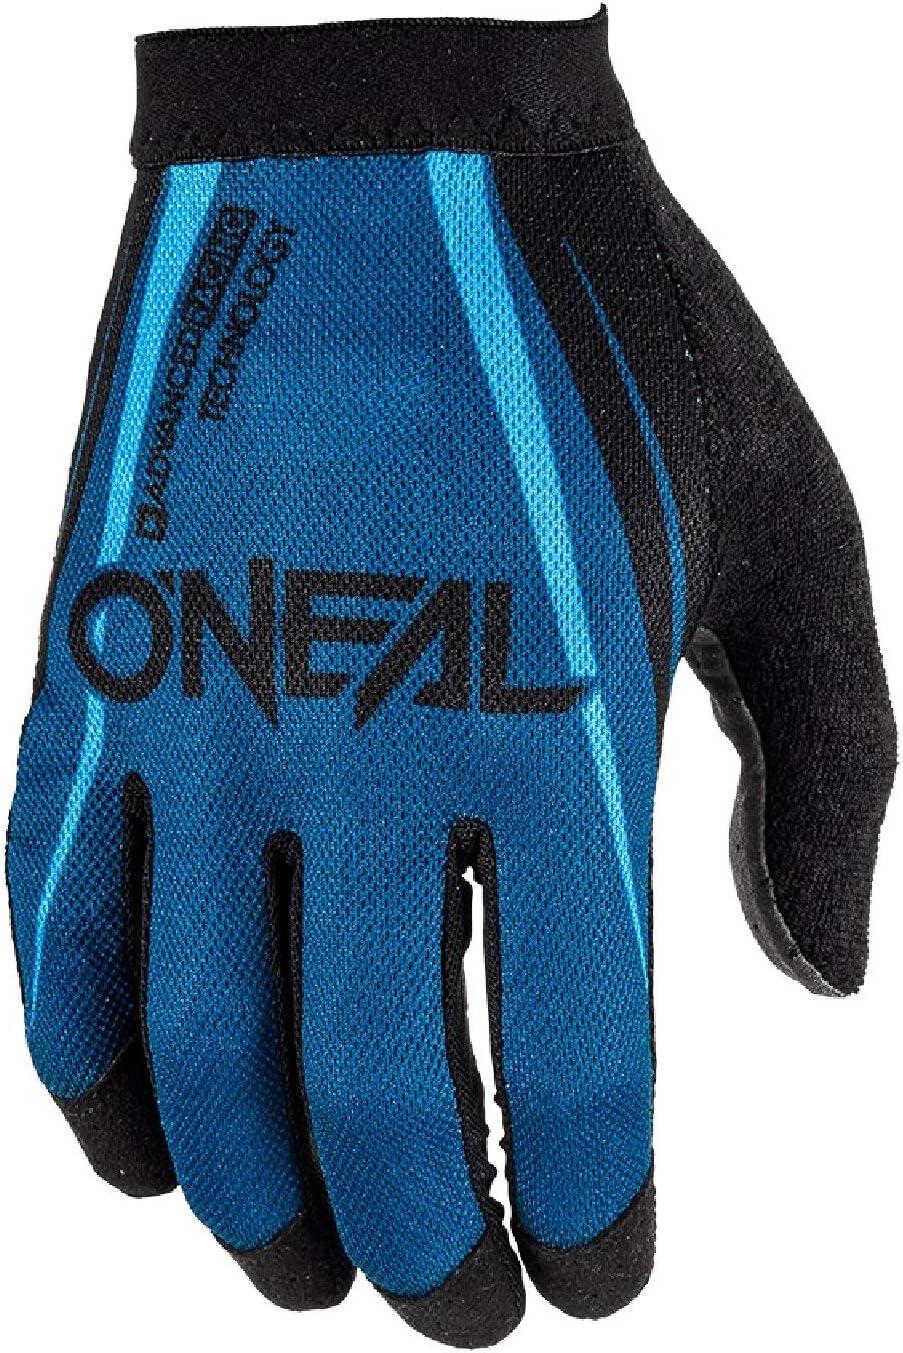 O Neal Amx Mx Dh Fr Fahrrad Handschuhe Lang Blocker Schwarz Blau 2020 Oneal Größe M 8 5 Auto